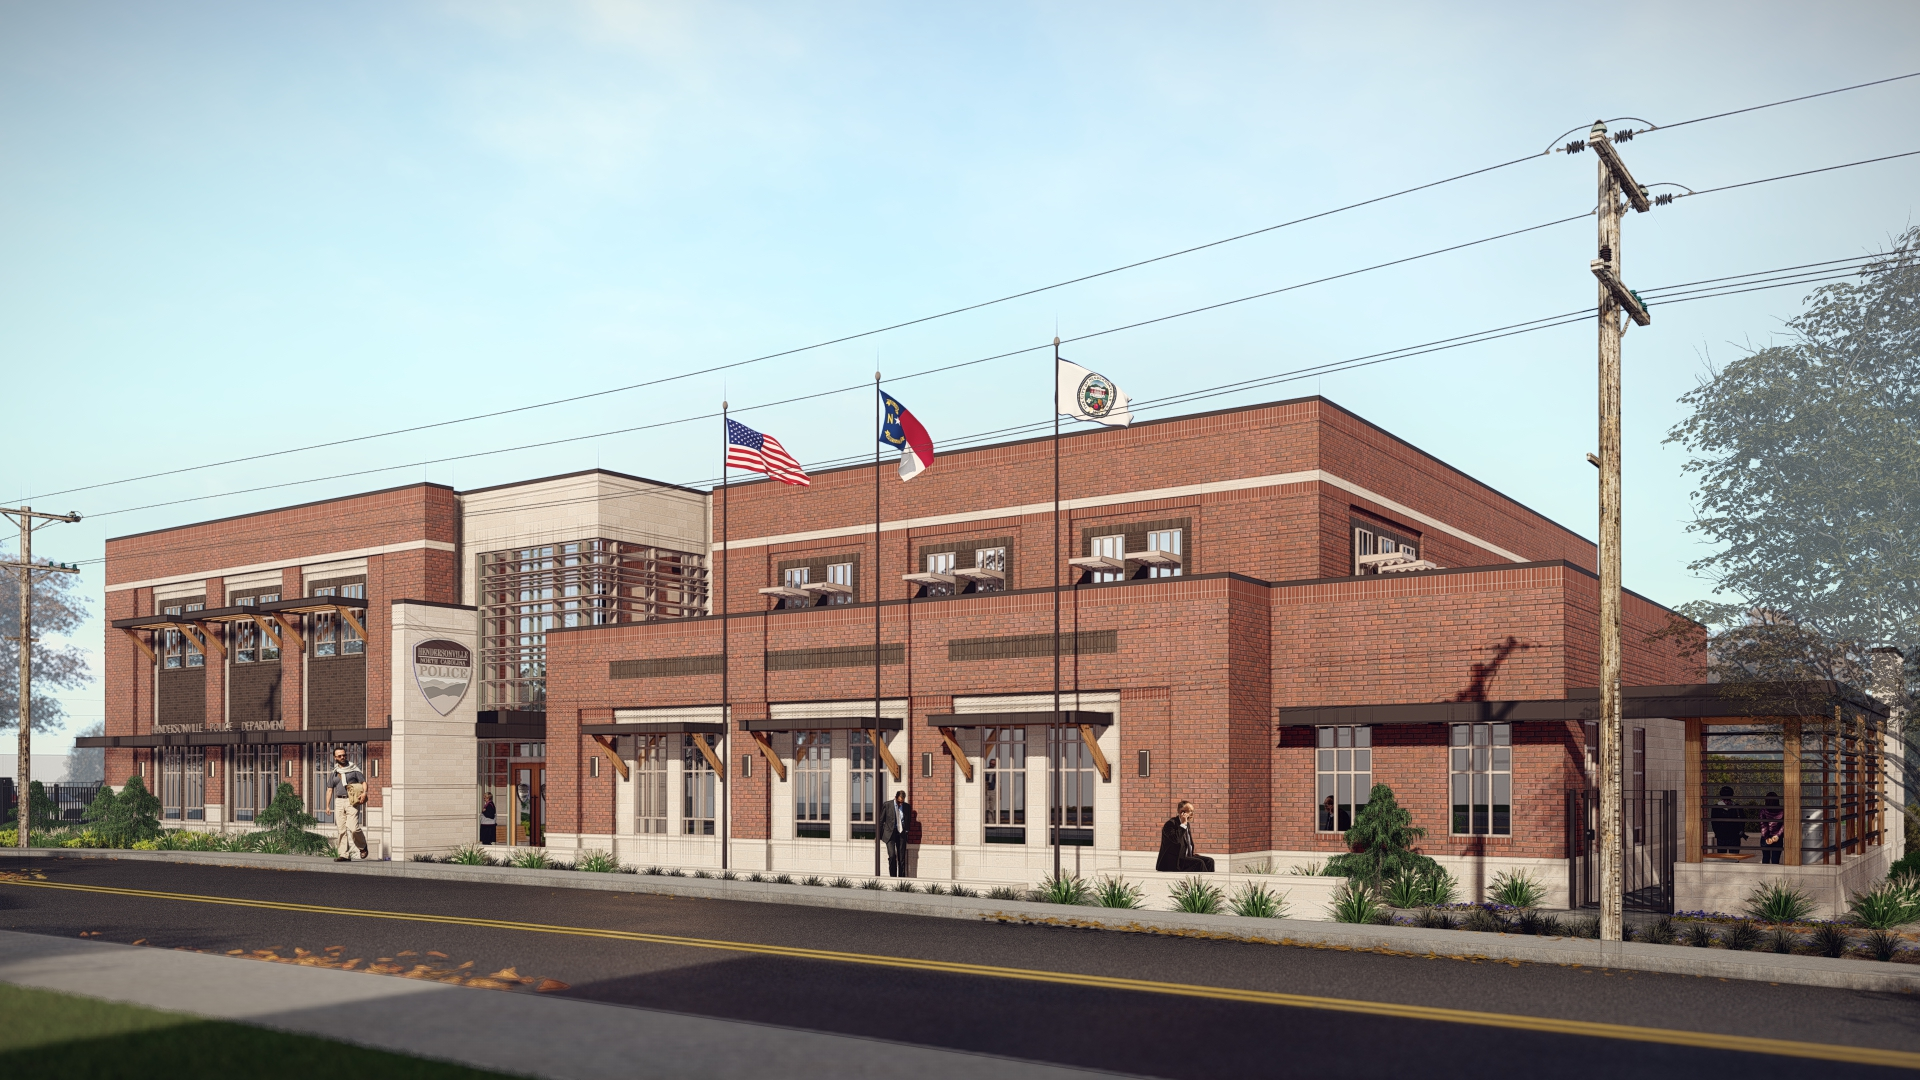 ADW-Public-Safety-Hendersonville-PD-Hendersonville-NC-Rendering-Exterior-Rendering.jpg